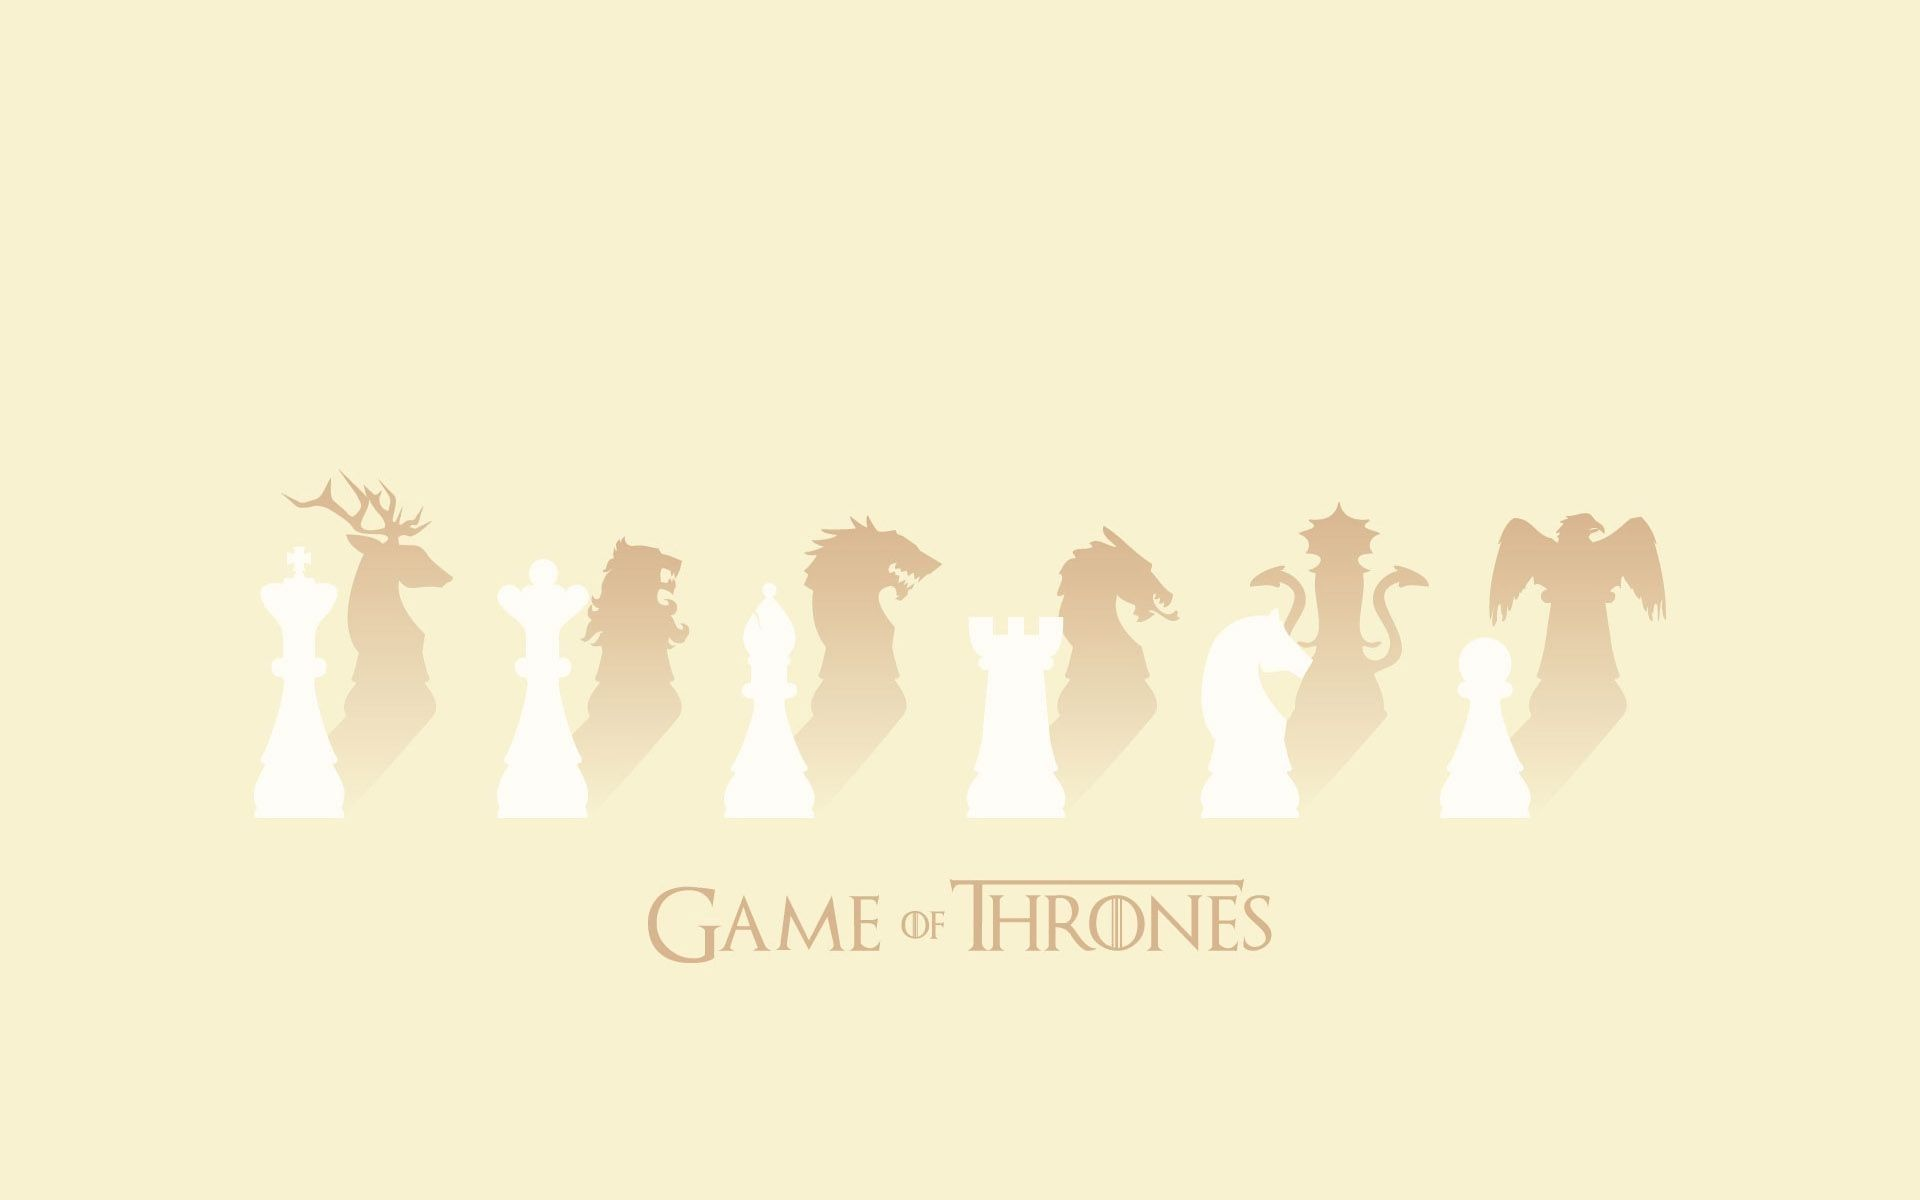 Game of Thrones Sigils chess minimalist